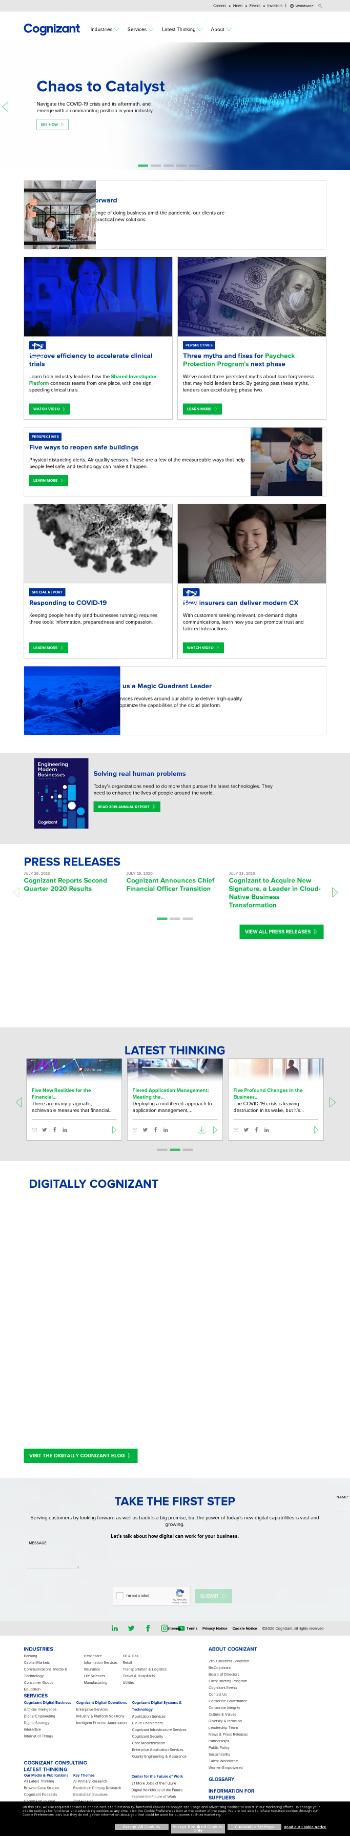 Cognizant Technology Solutions Corporation Website Screenshot